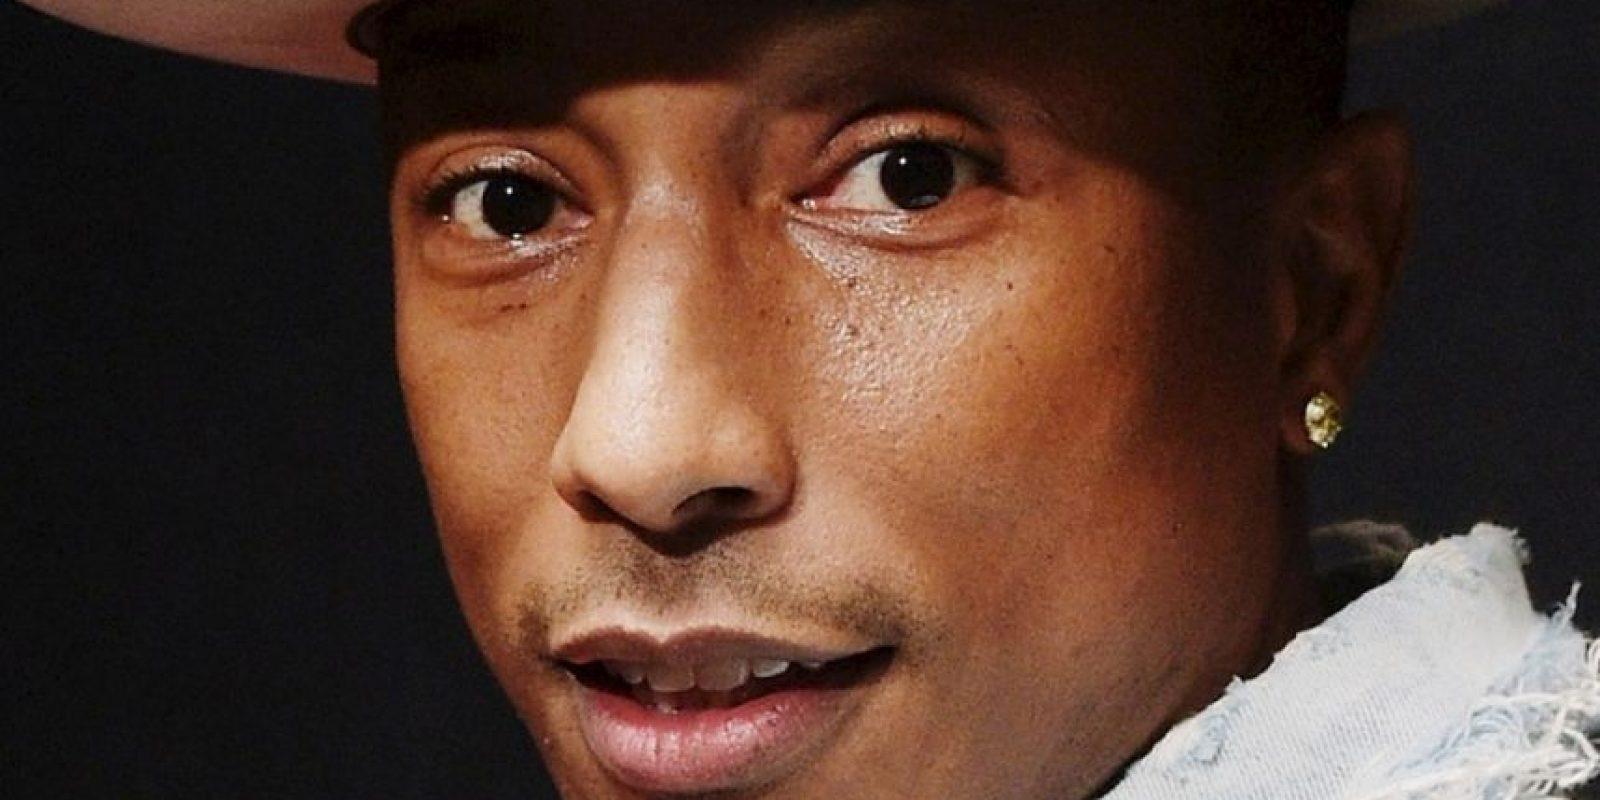 Famosos como Pharrell se ofrecieron a cantar. Foto:Getty Images